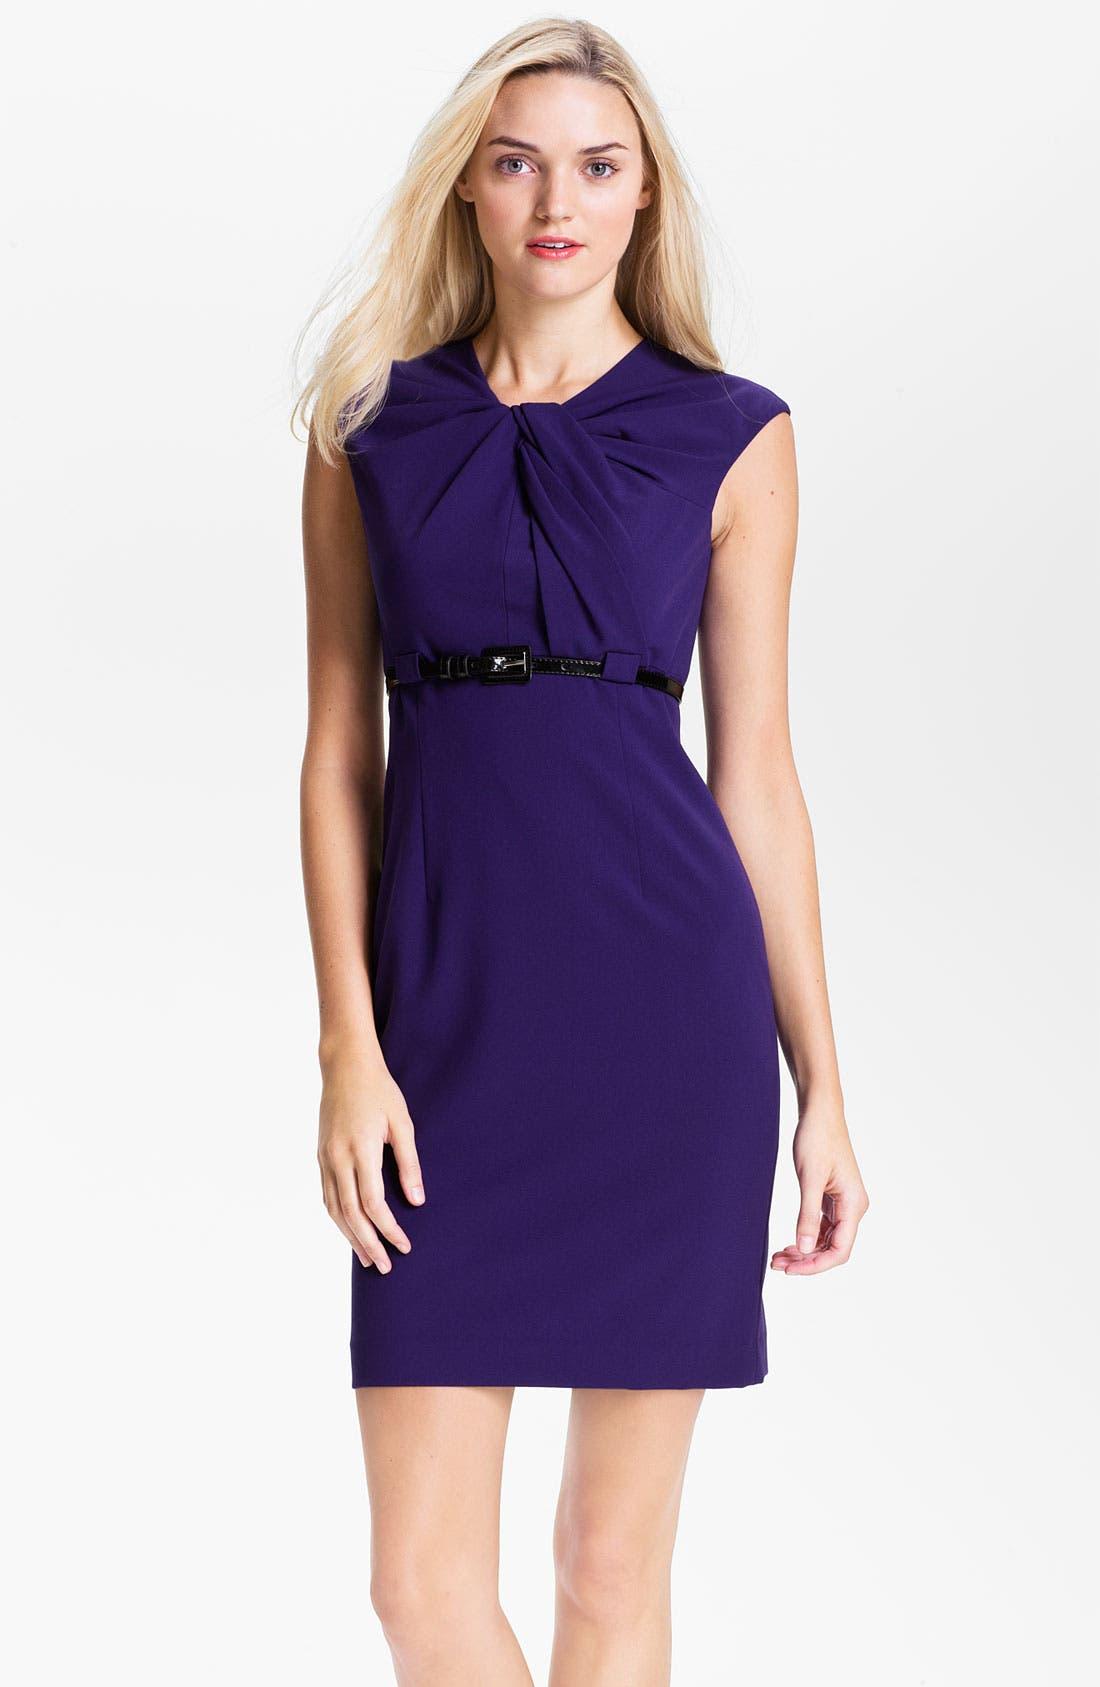 Alternate Image 1 Selected - Calvin Klein Twist Neck Belted Sheath Dress (Petite)